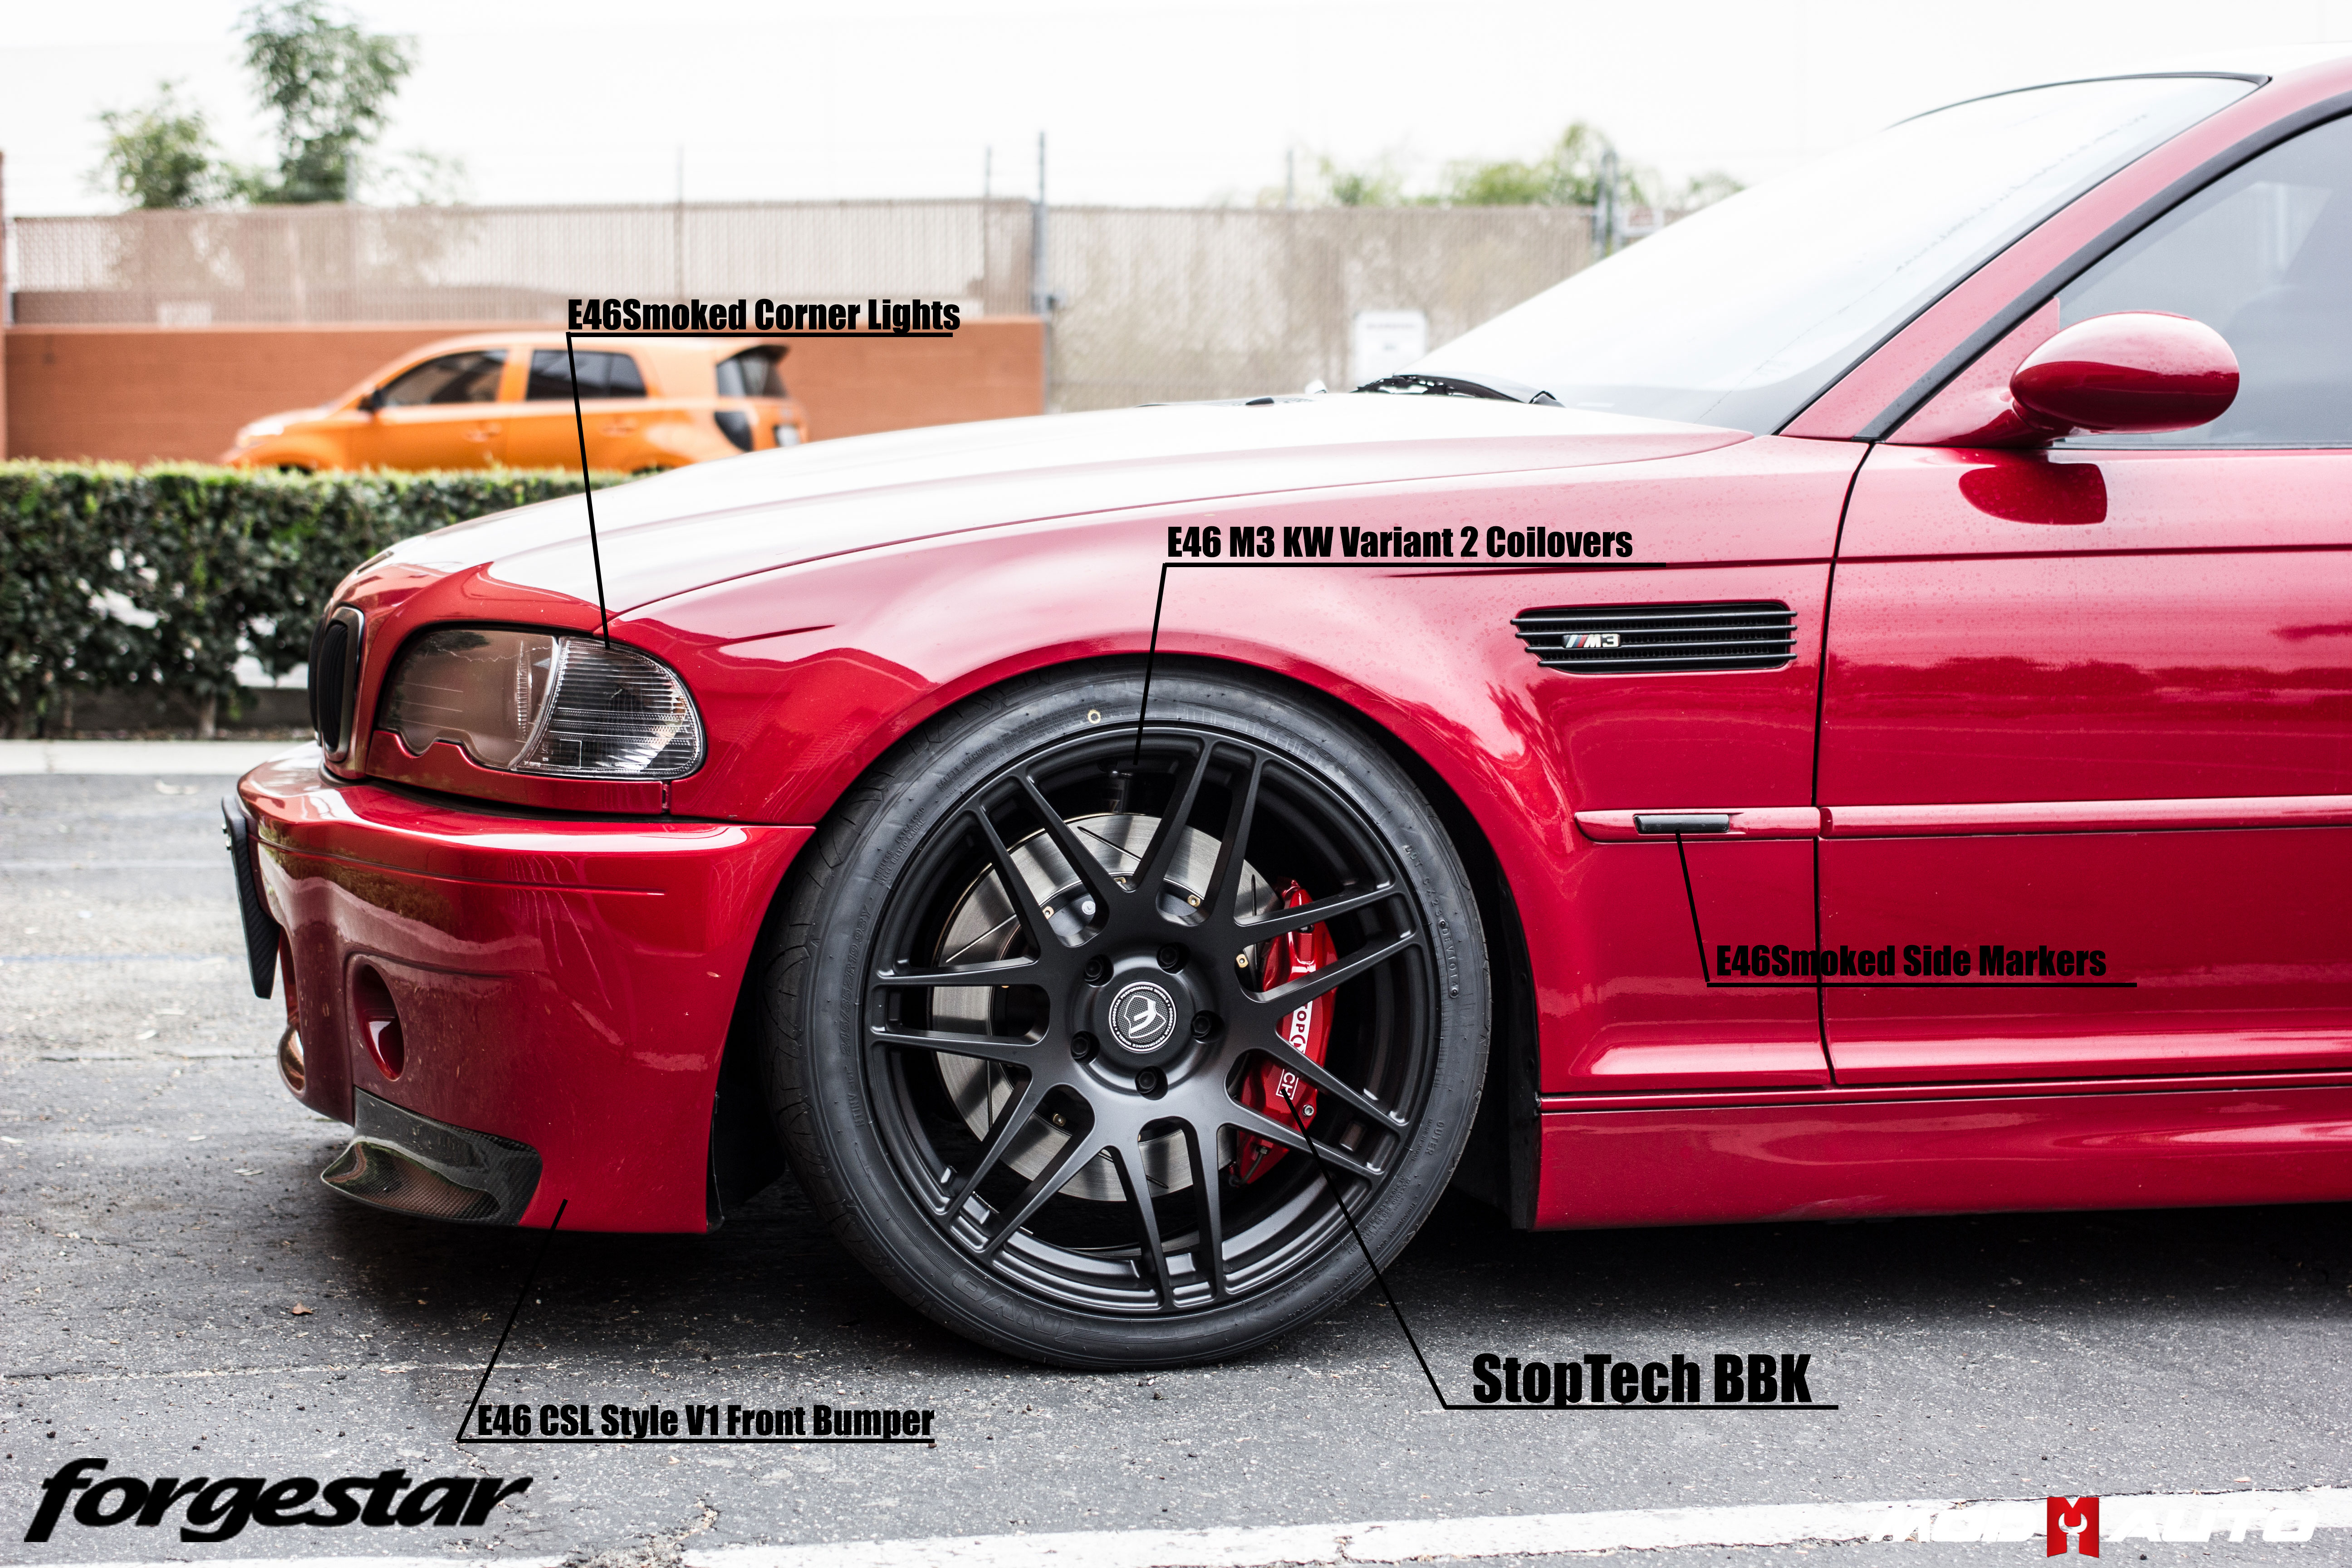 Bmw E46 M3 On Forgestar F14 Semi Gloss Black 19 8 5 19 10 Stoptech Big Brake Kit Mod Auto